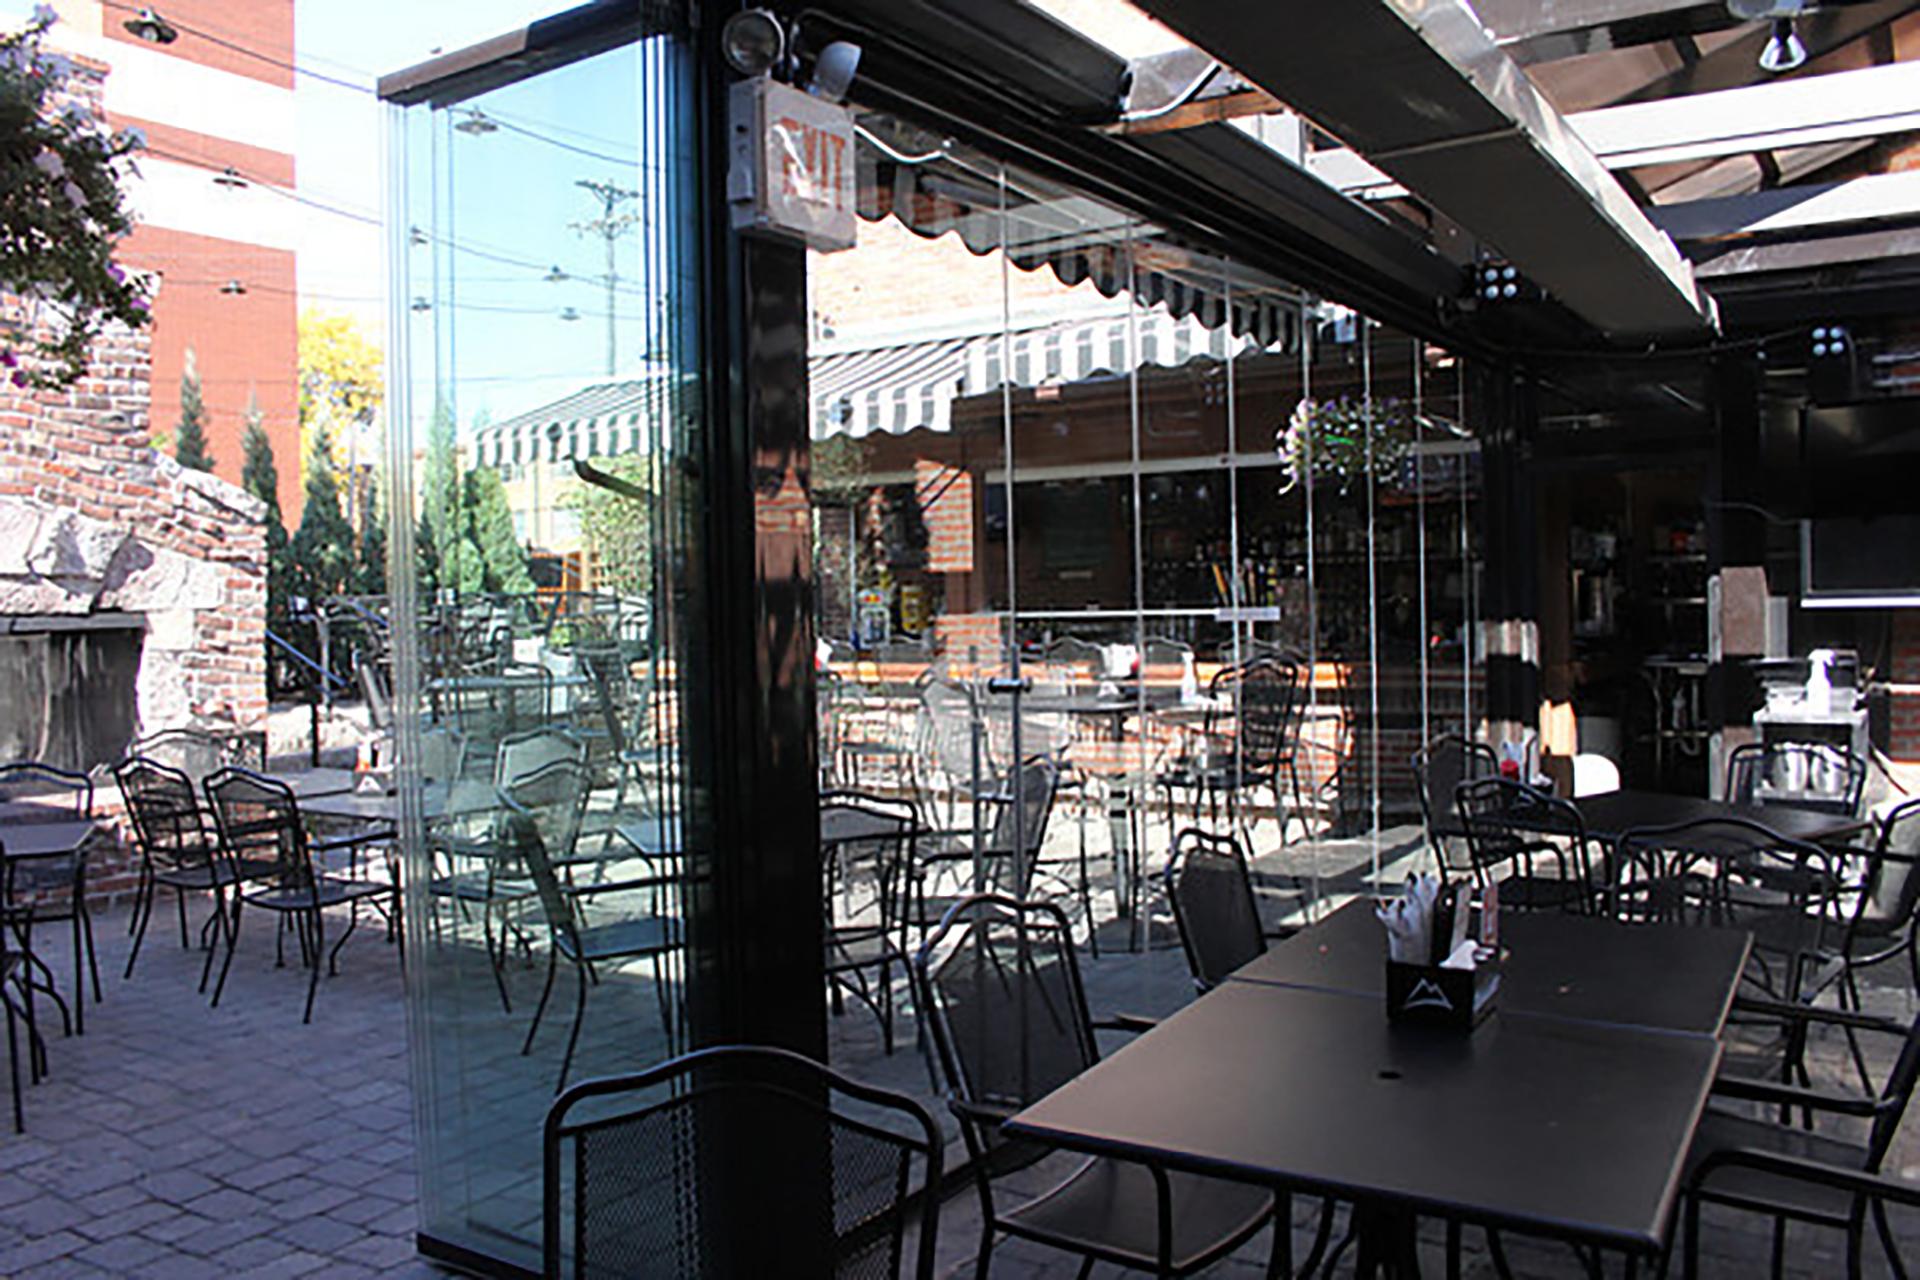 Opening frameless glass walls at restaurant